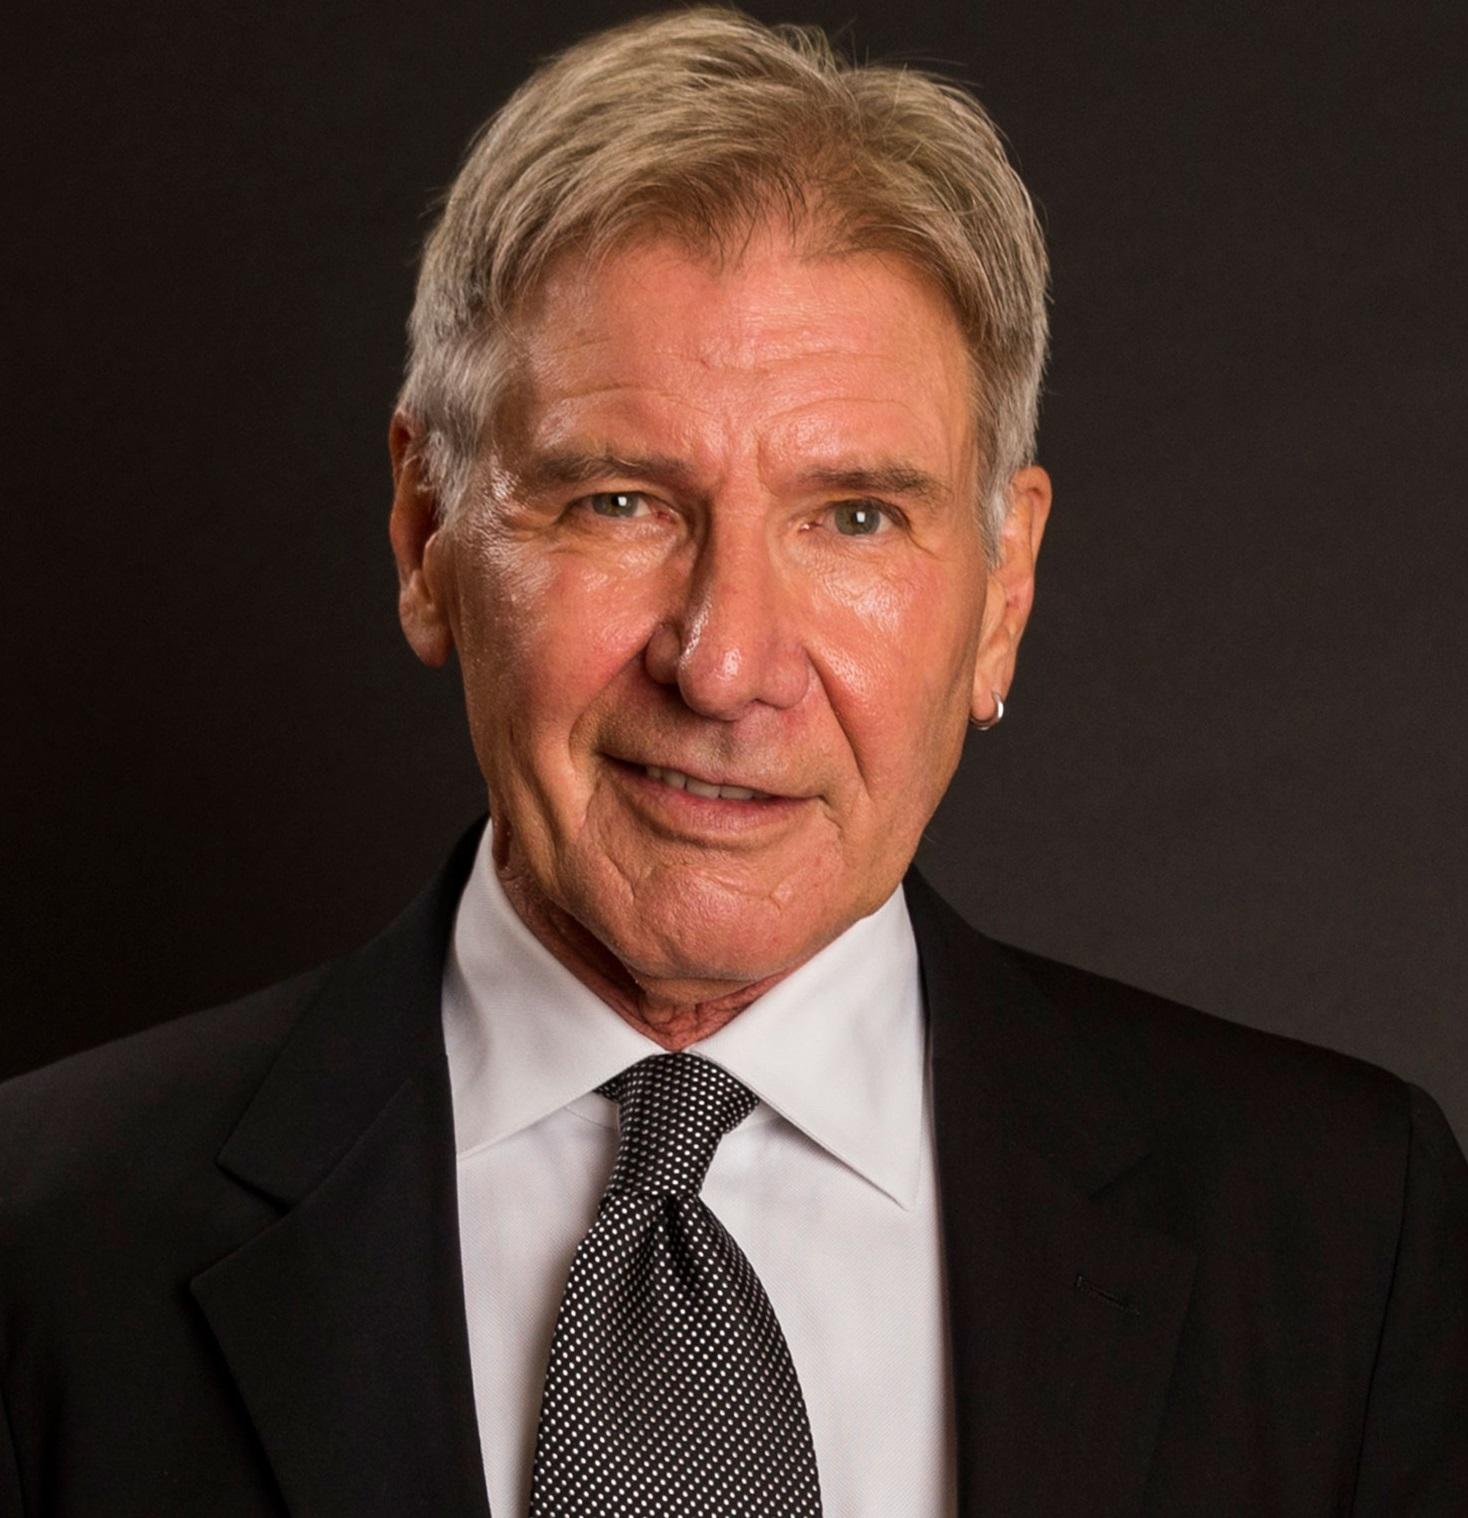 Hyrum Graff   Harrison Ford  Presumed Innocent Trailer